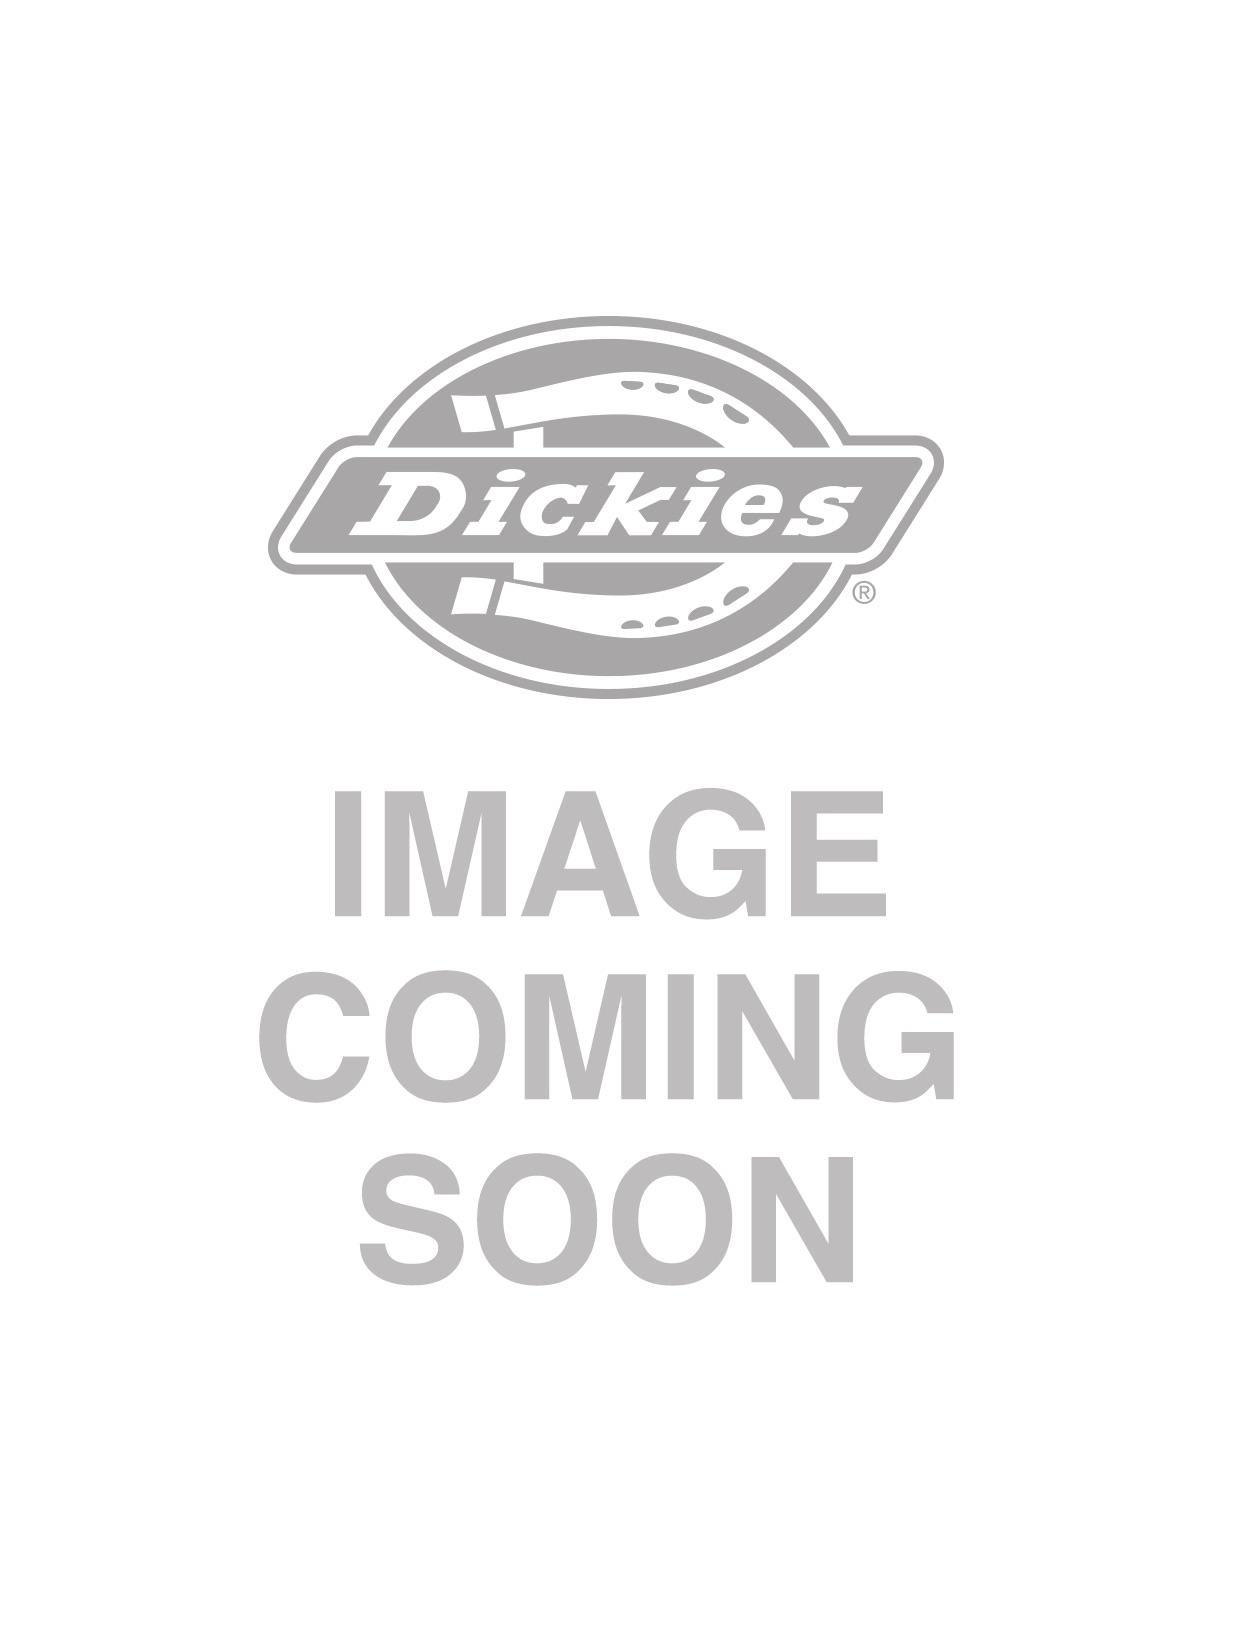 e0252cea29e563 Dickies Kingsley Zip Hoody